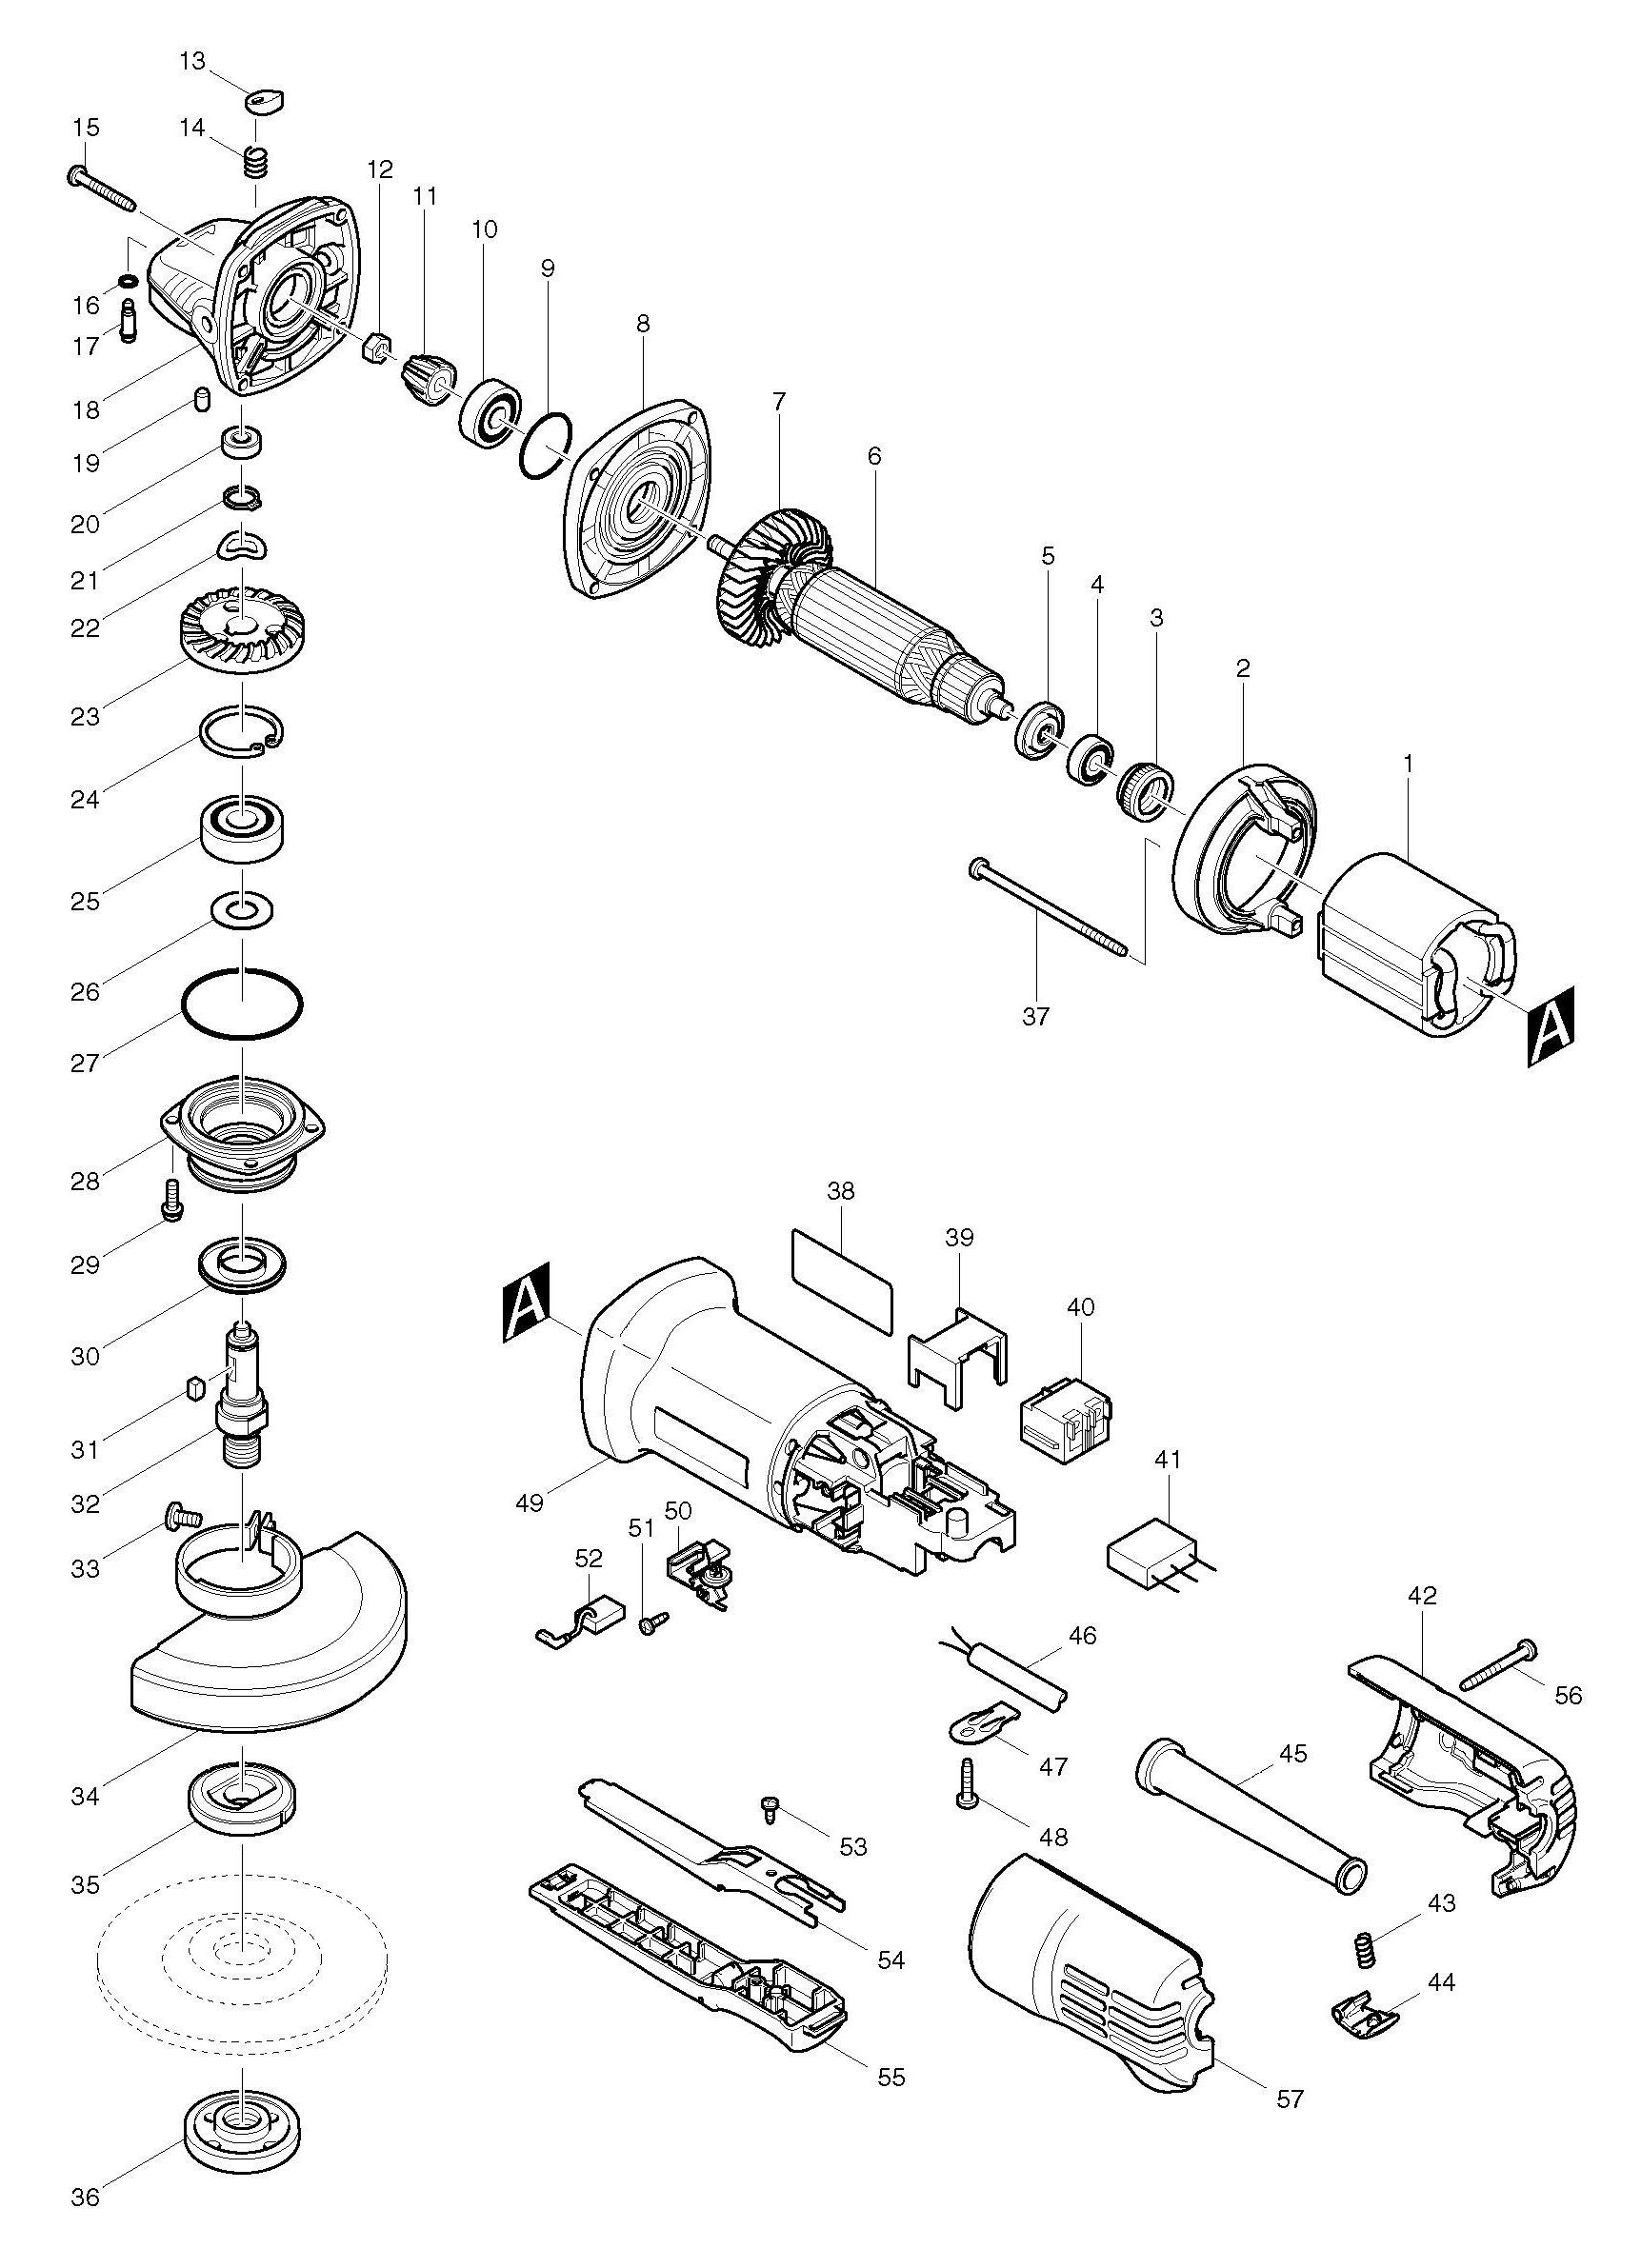 Spares for Makita 9557pb 115mm Angle Grinder SPARE_9557PB